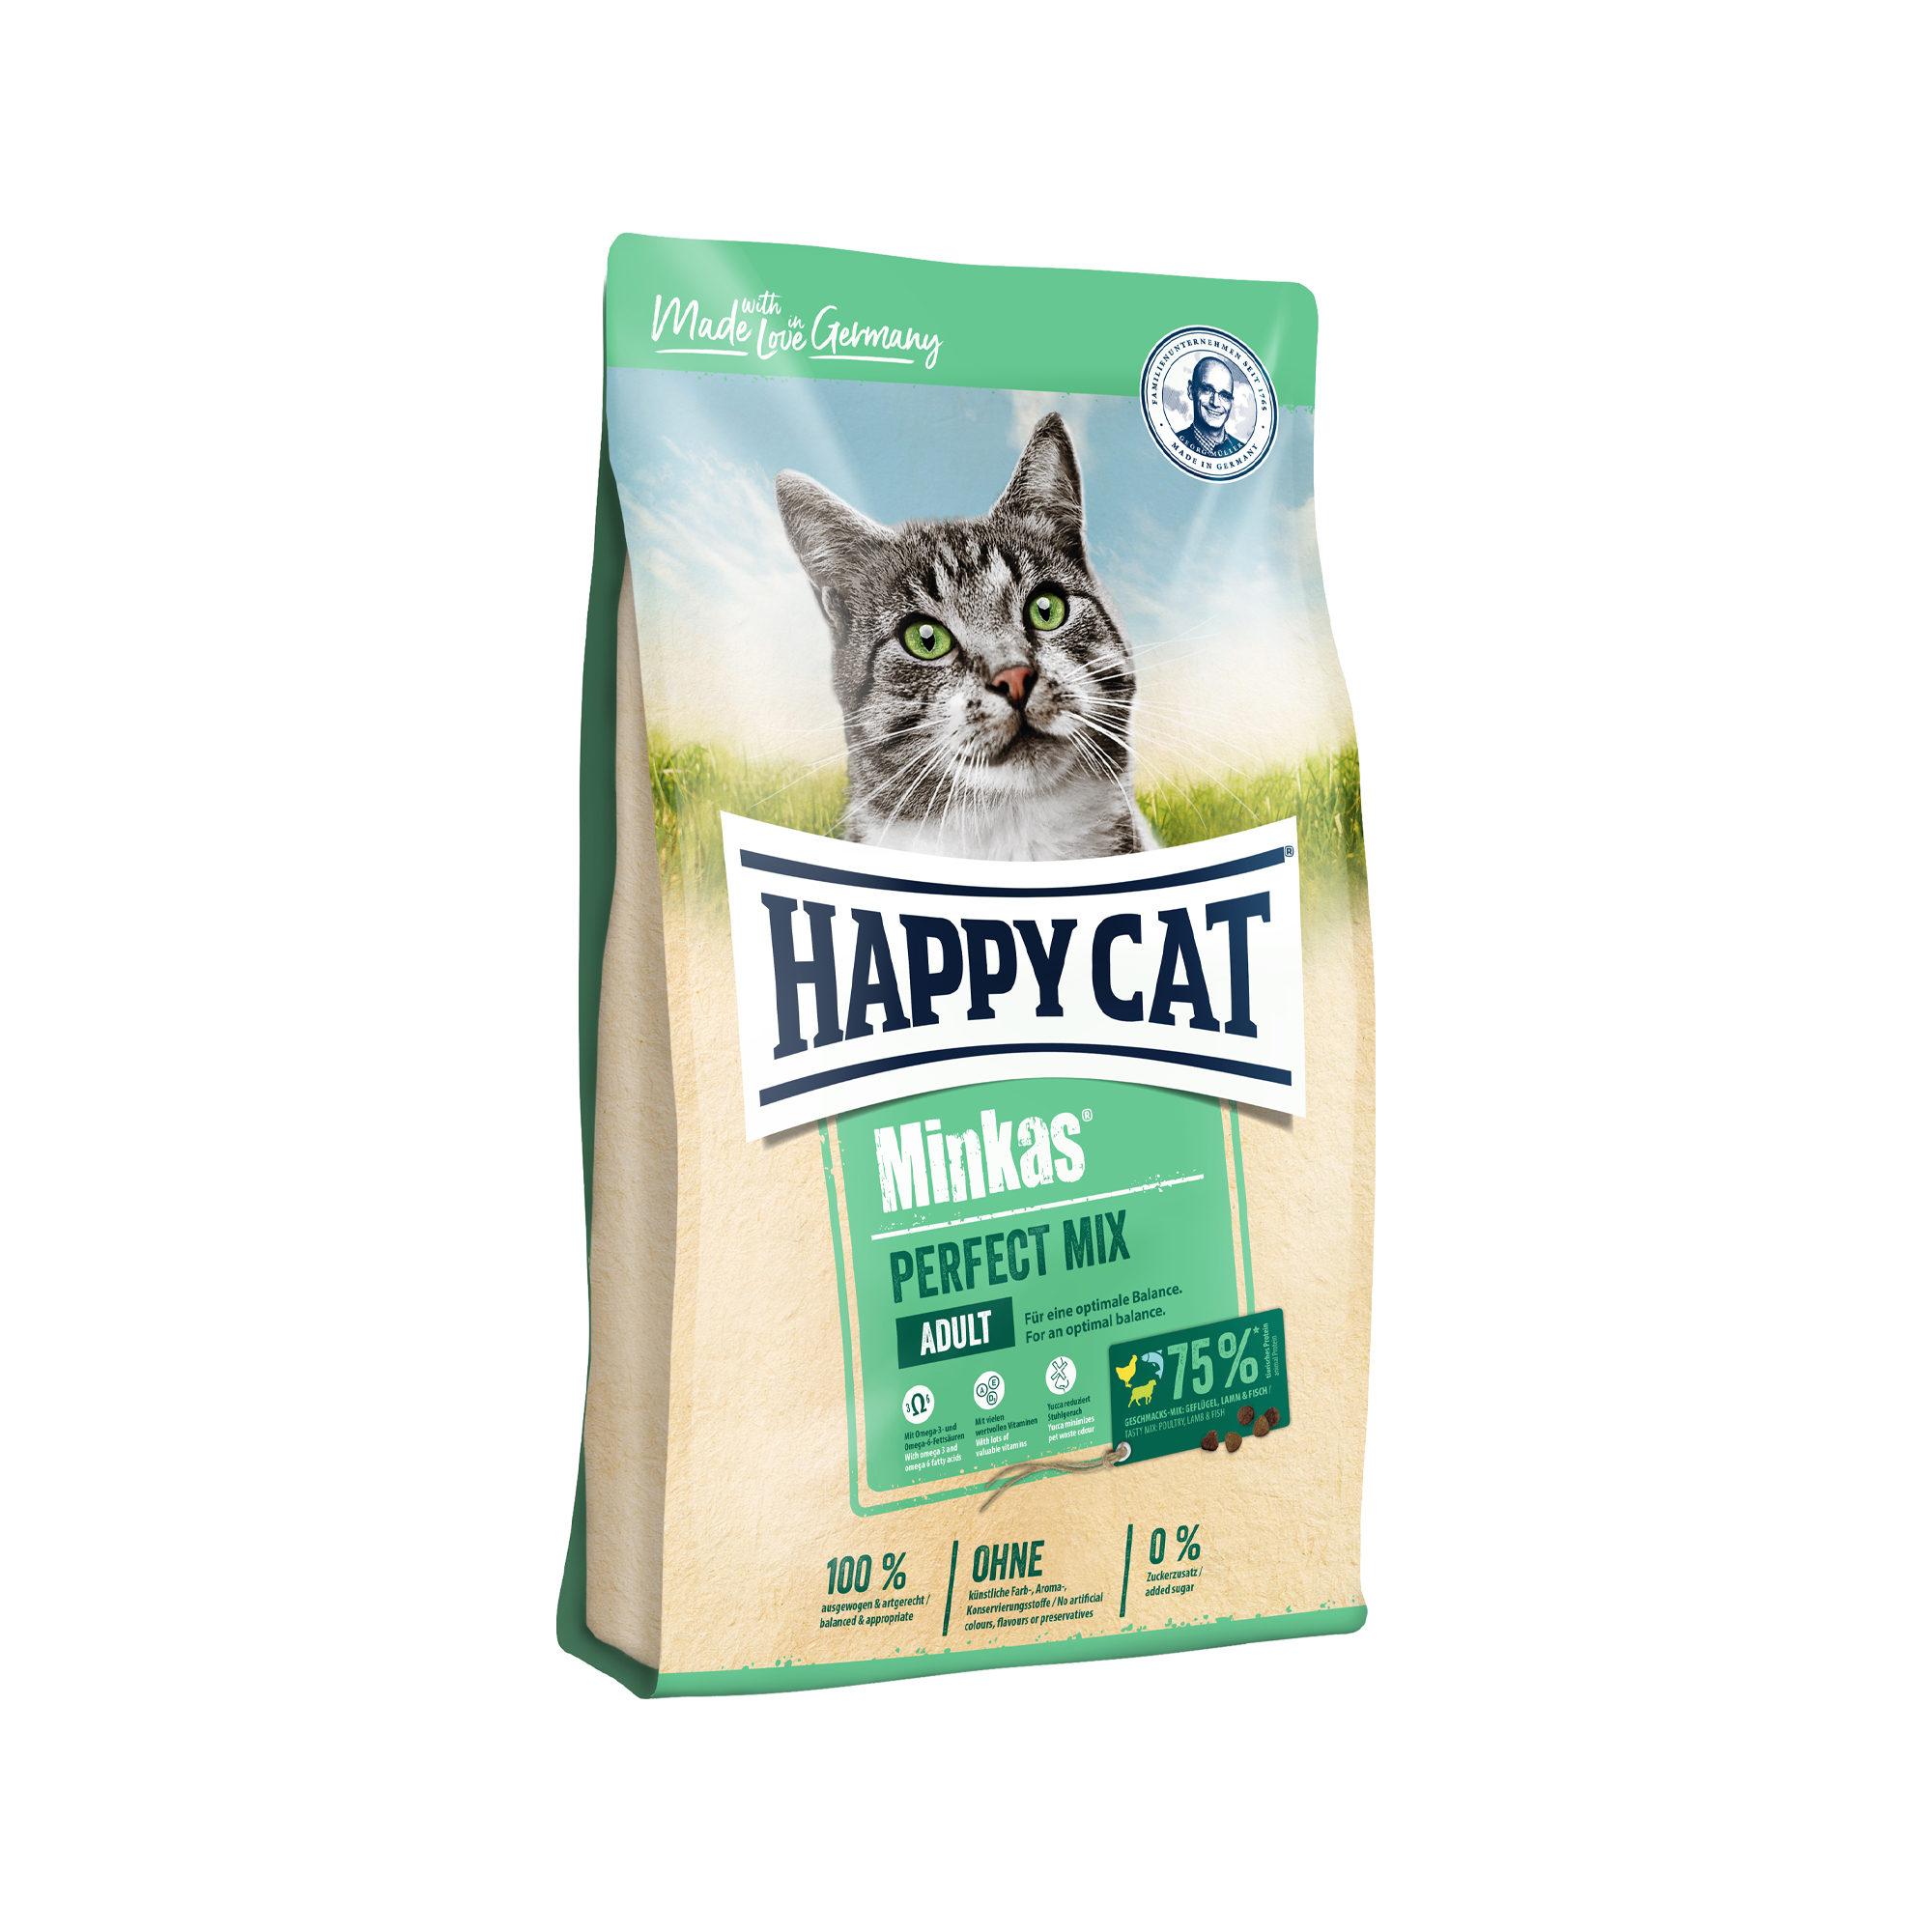 Happy Cat Minkas Perfect Mix Adult Katzenfutter - Geflügel, Lamm & Fisch